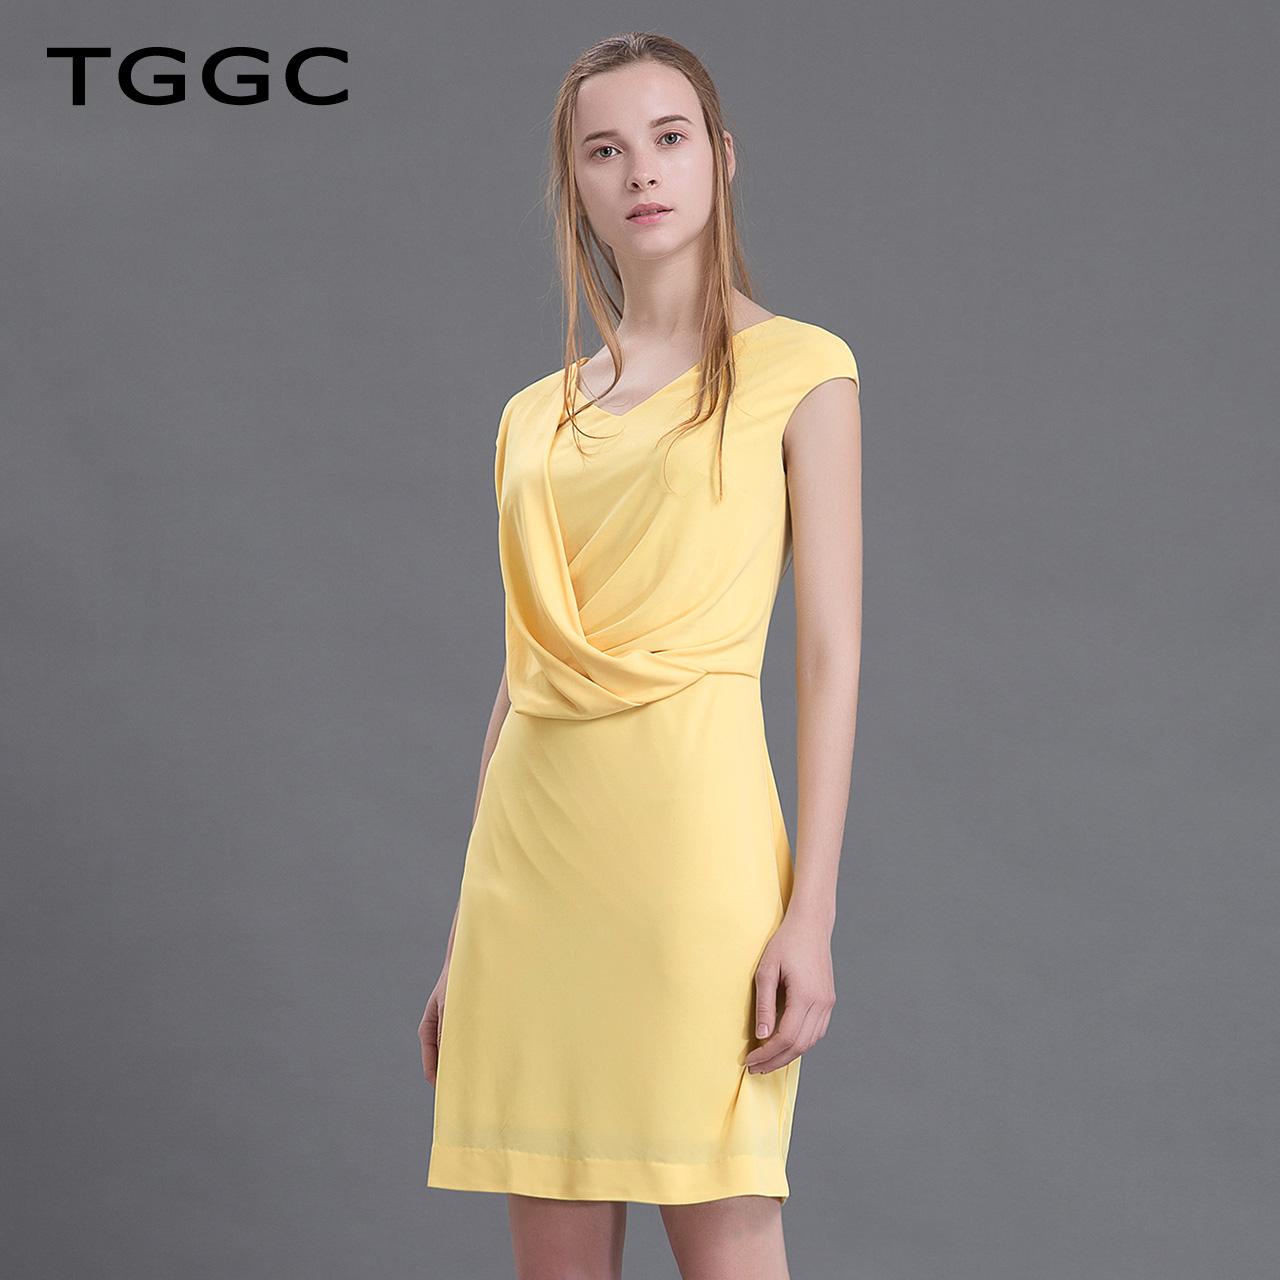 TGGC 2018年夏装 气质通勤高腰修身V领雪纺短袖女连衣裙 F20550